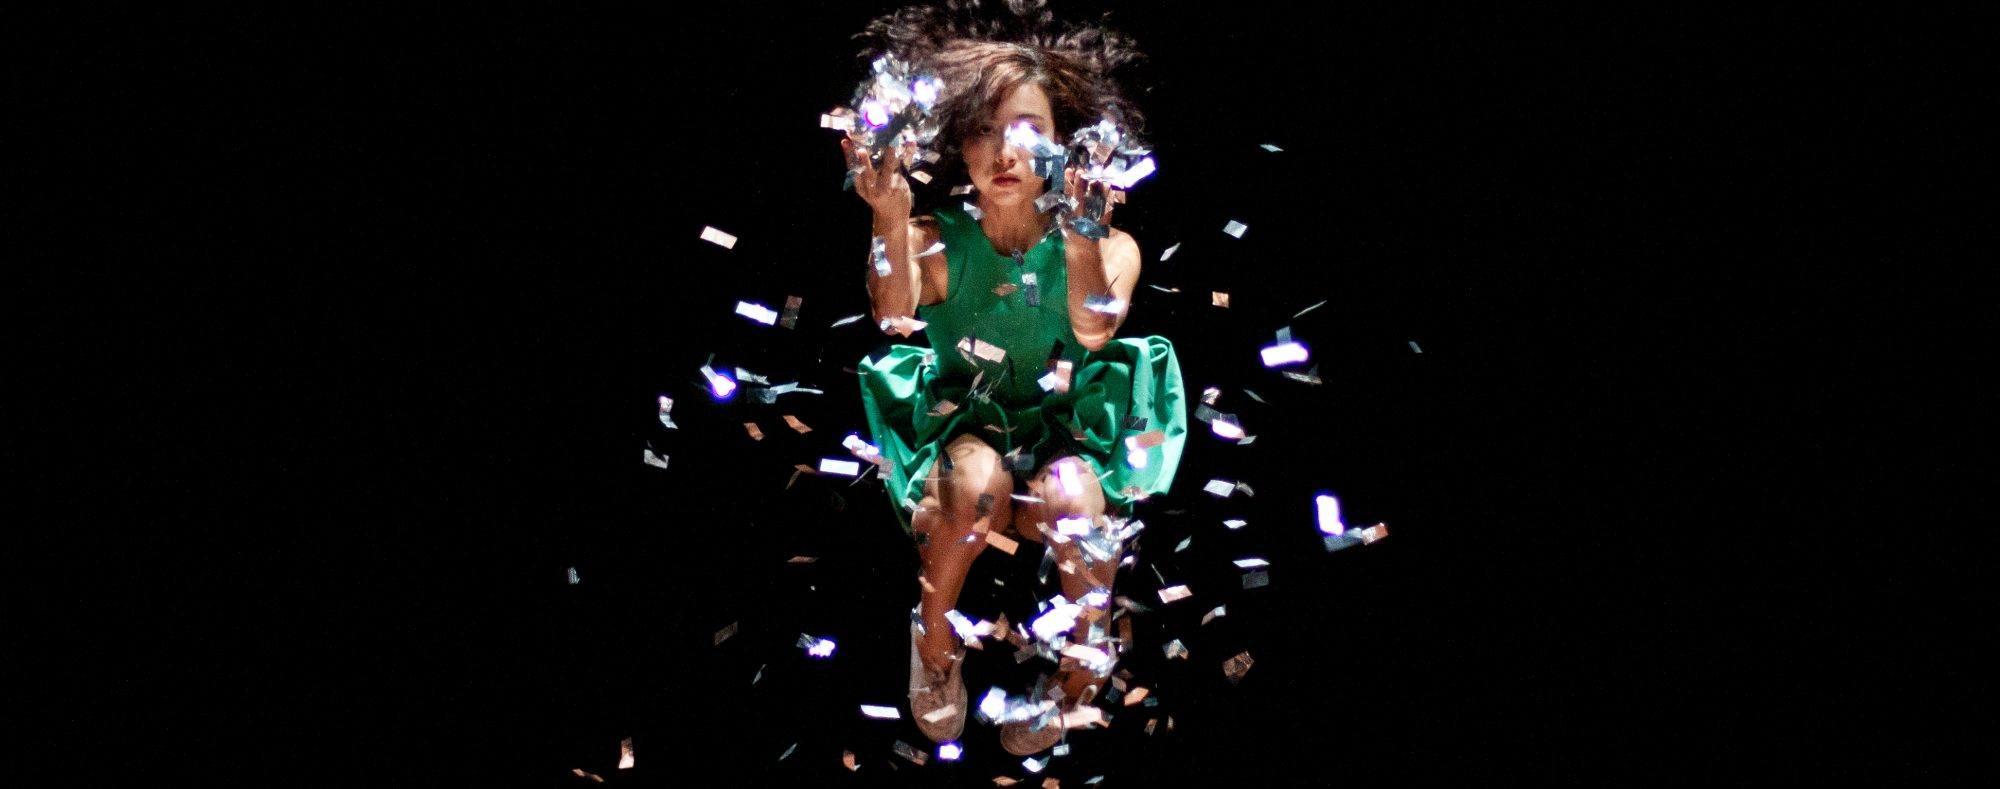 SuperModern Dance of Distraction, image: Tim Thatcher